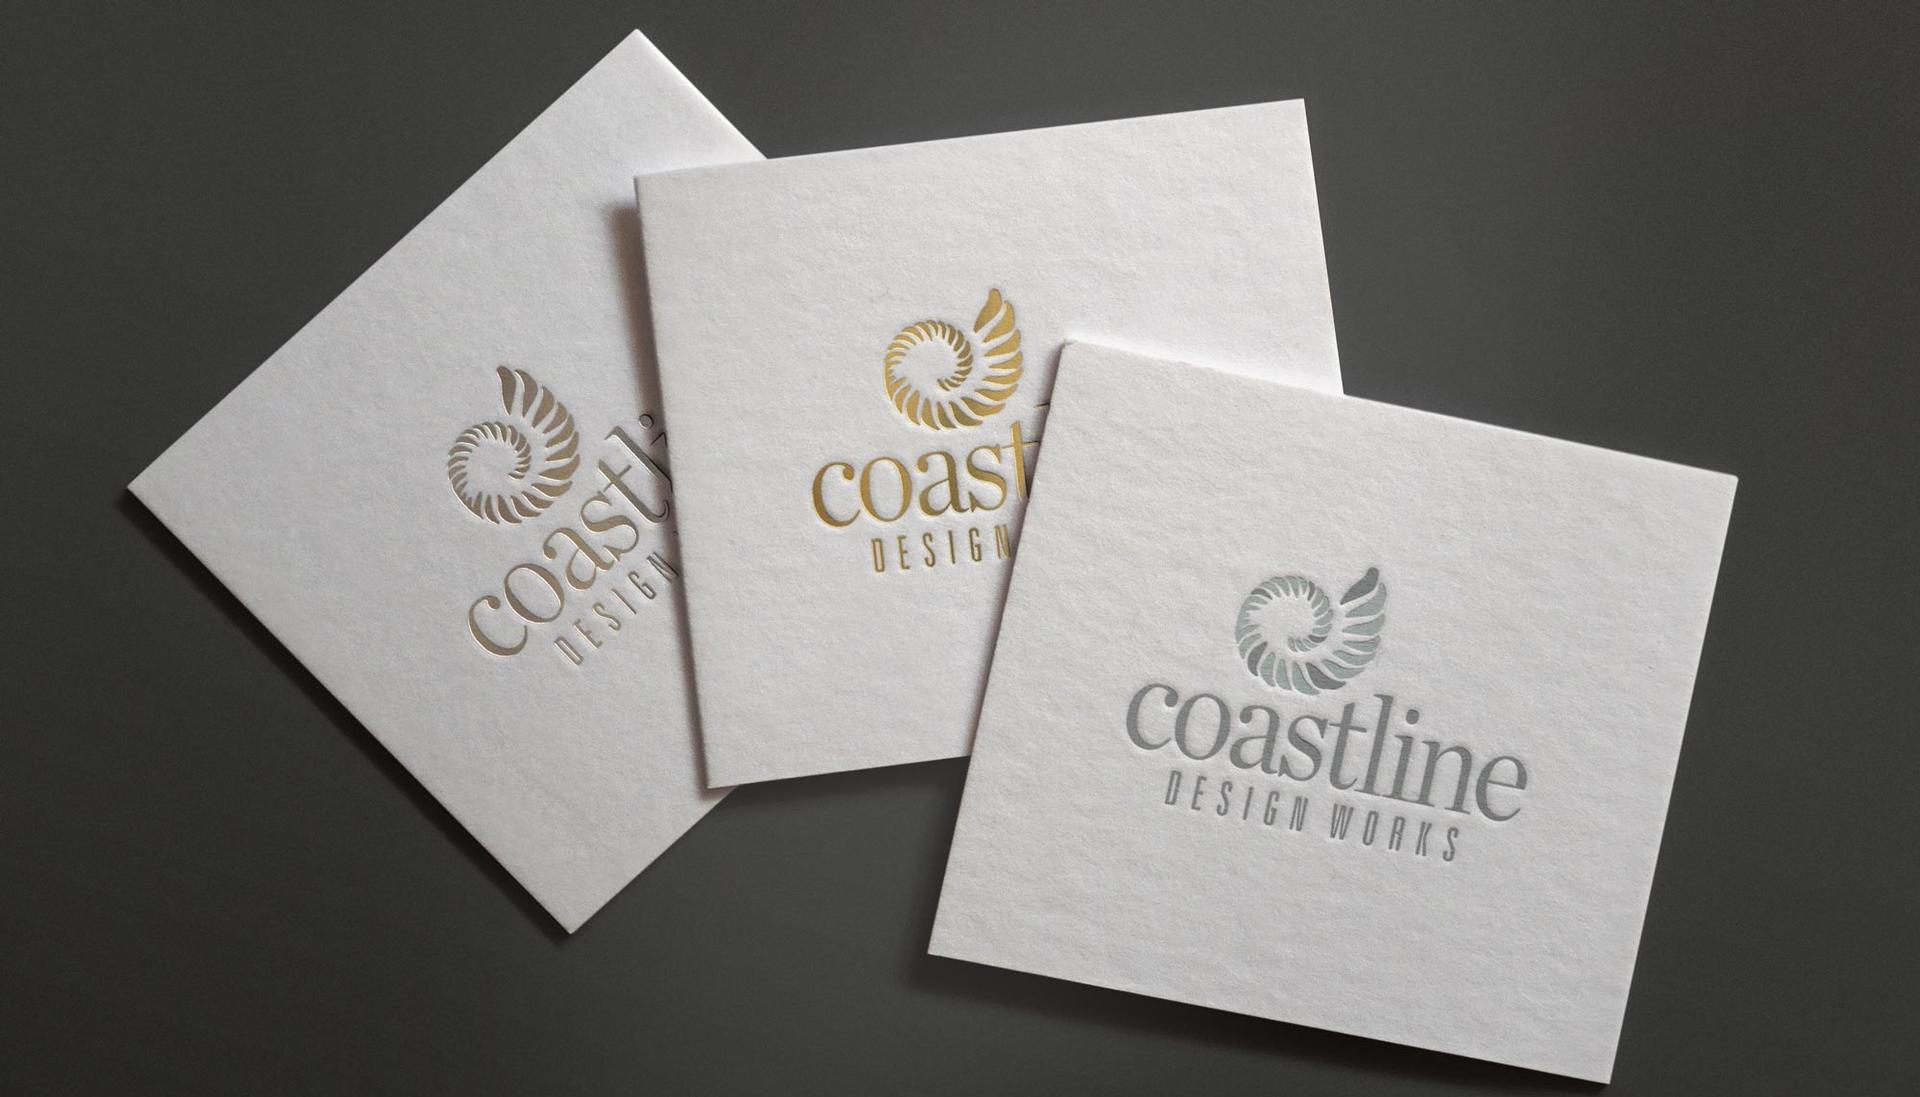 Coastline Design Works